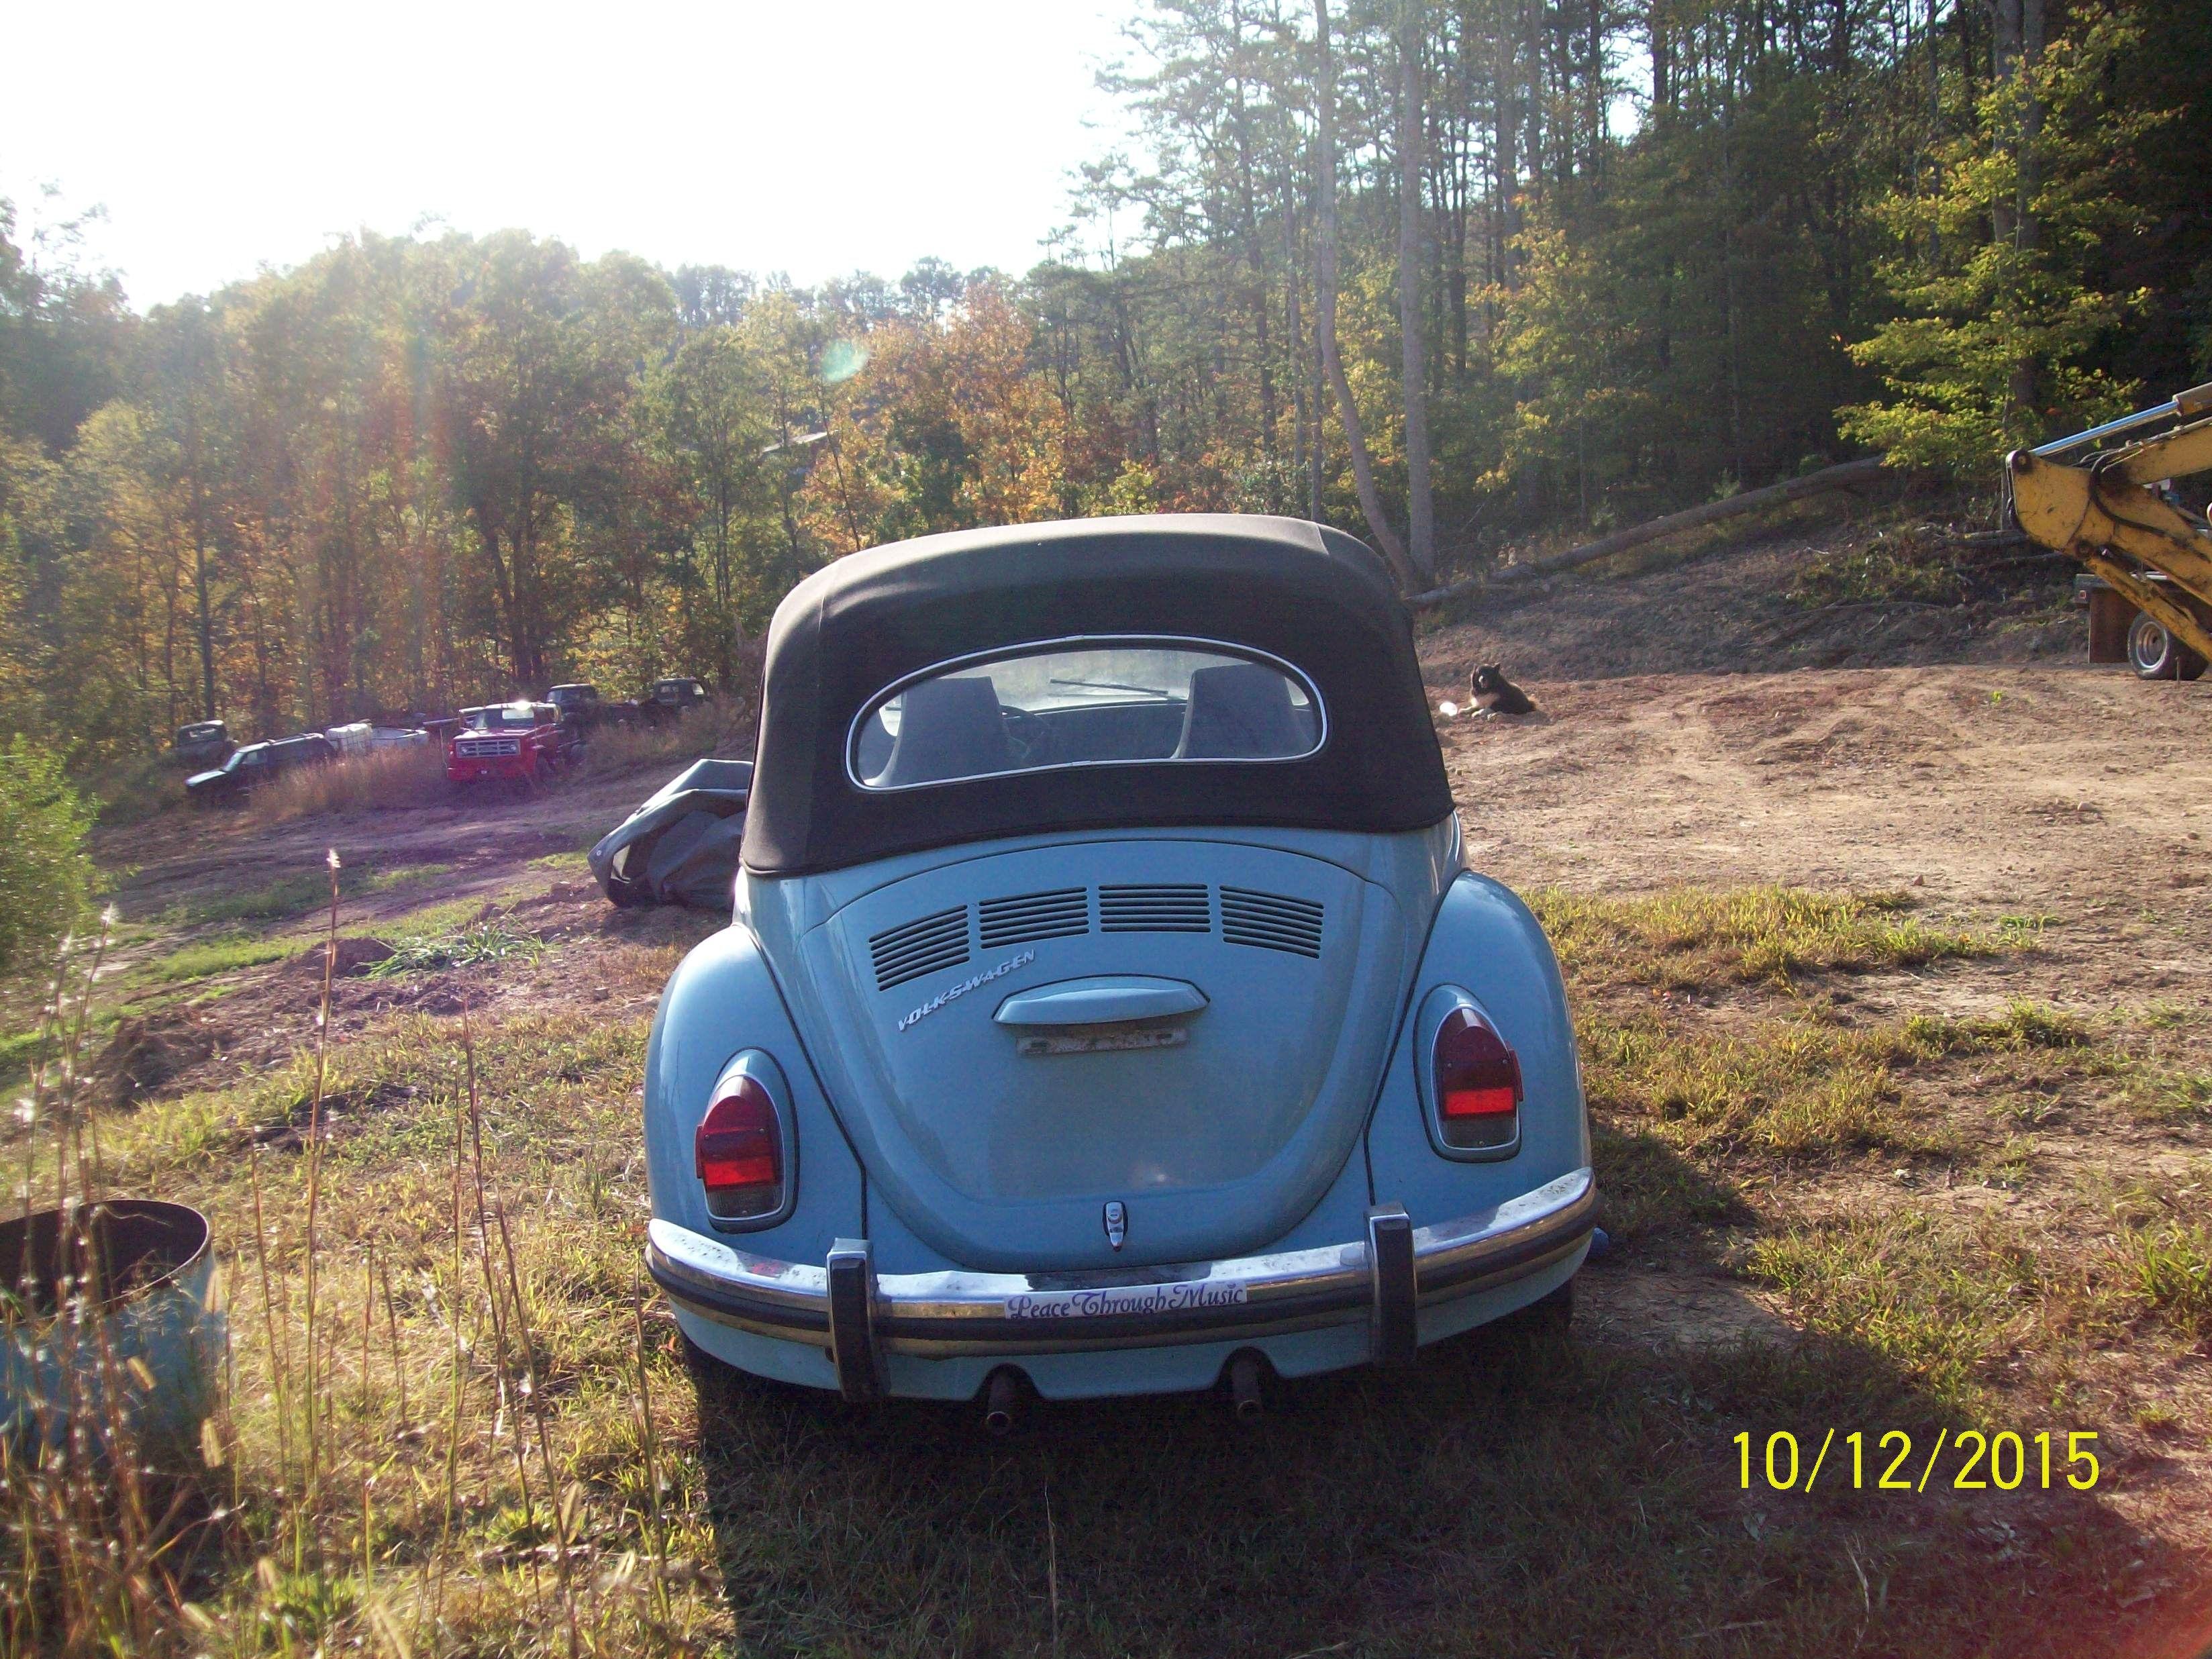 fusca andr brand meu on beetle and jorginho volkswagen pin beetles o craigslist by vw pinterest